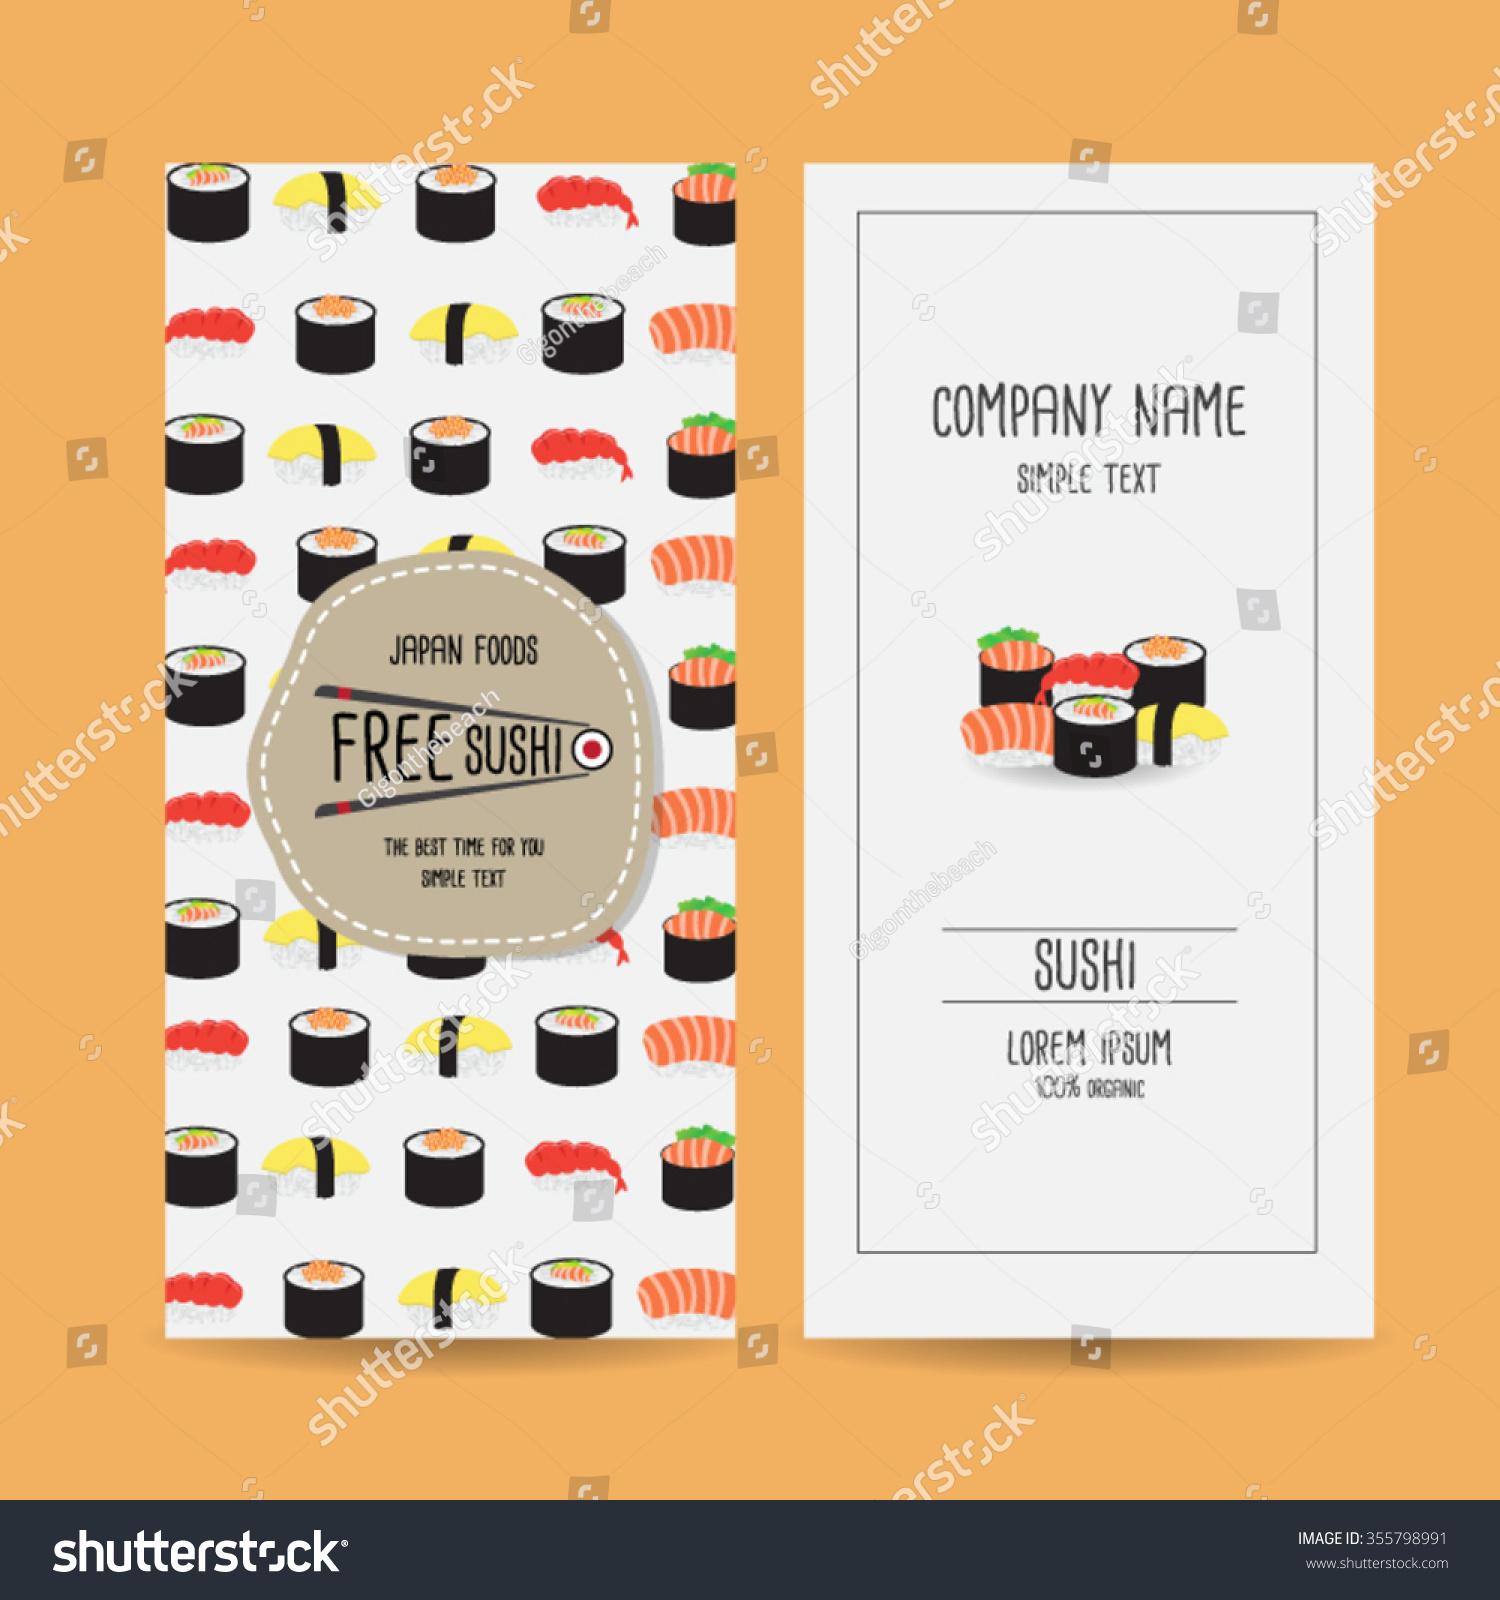 Set Japan Food Voucher Template Design Vector 355798991 – Food Voucher Template